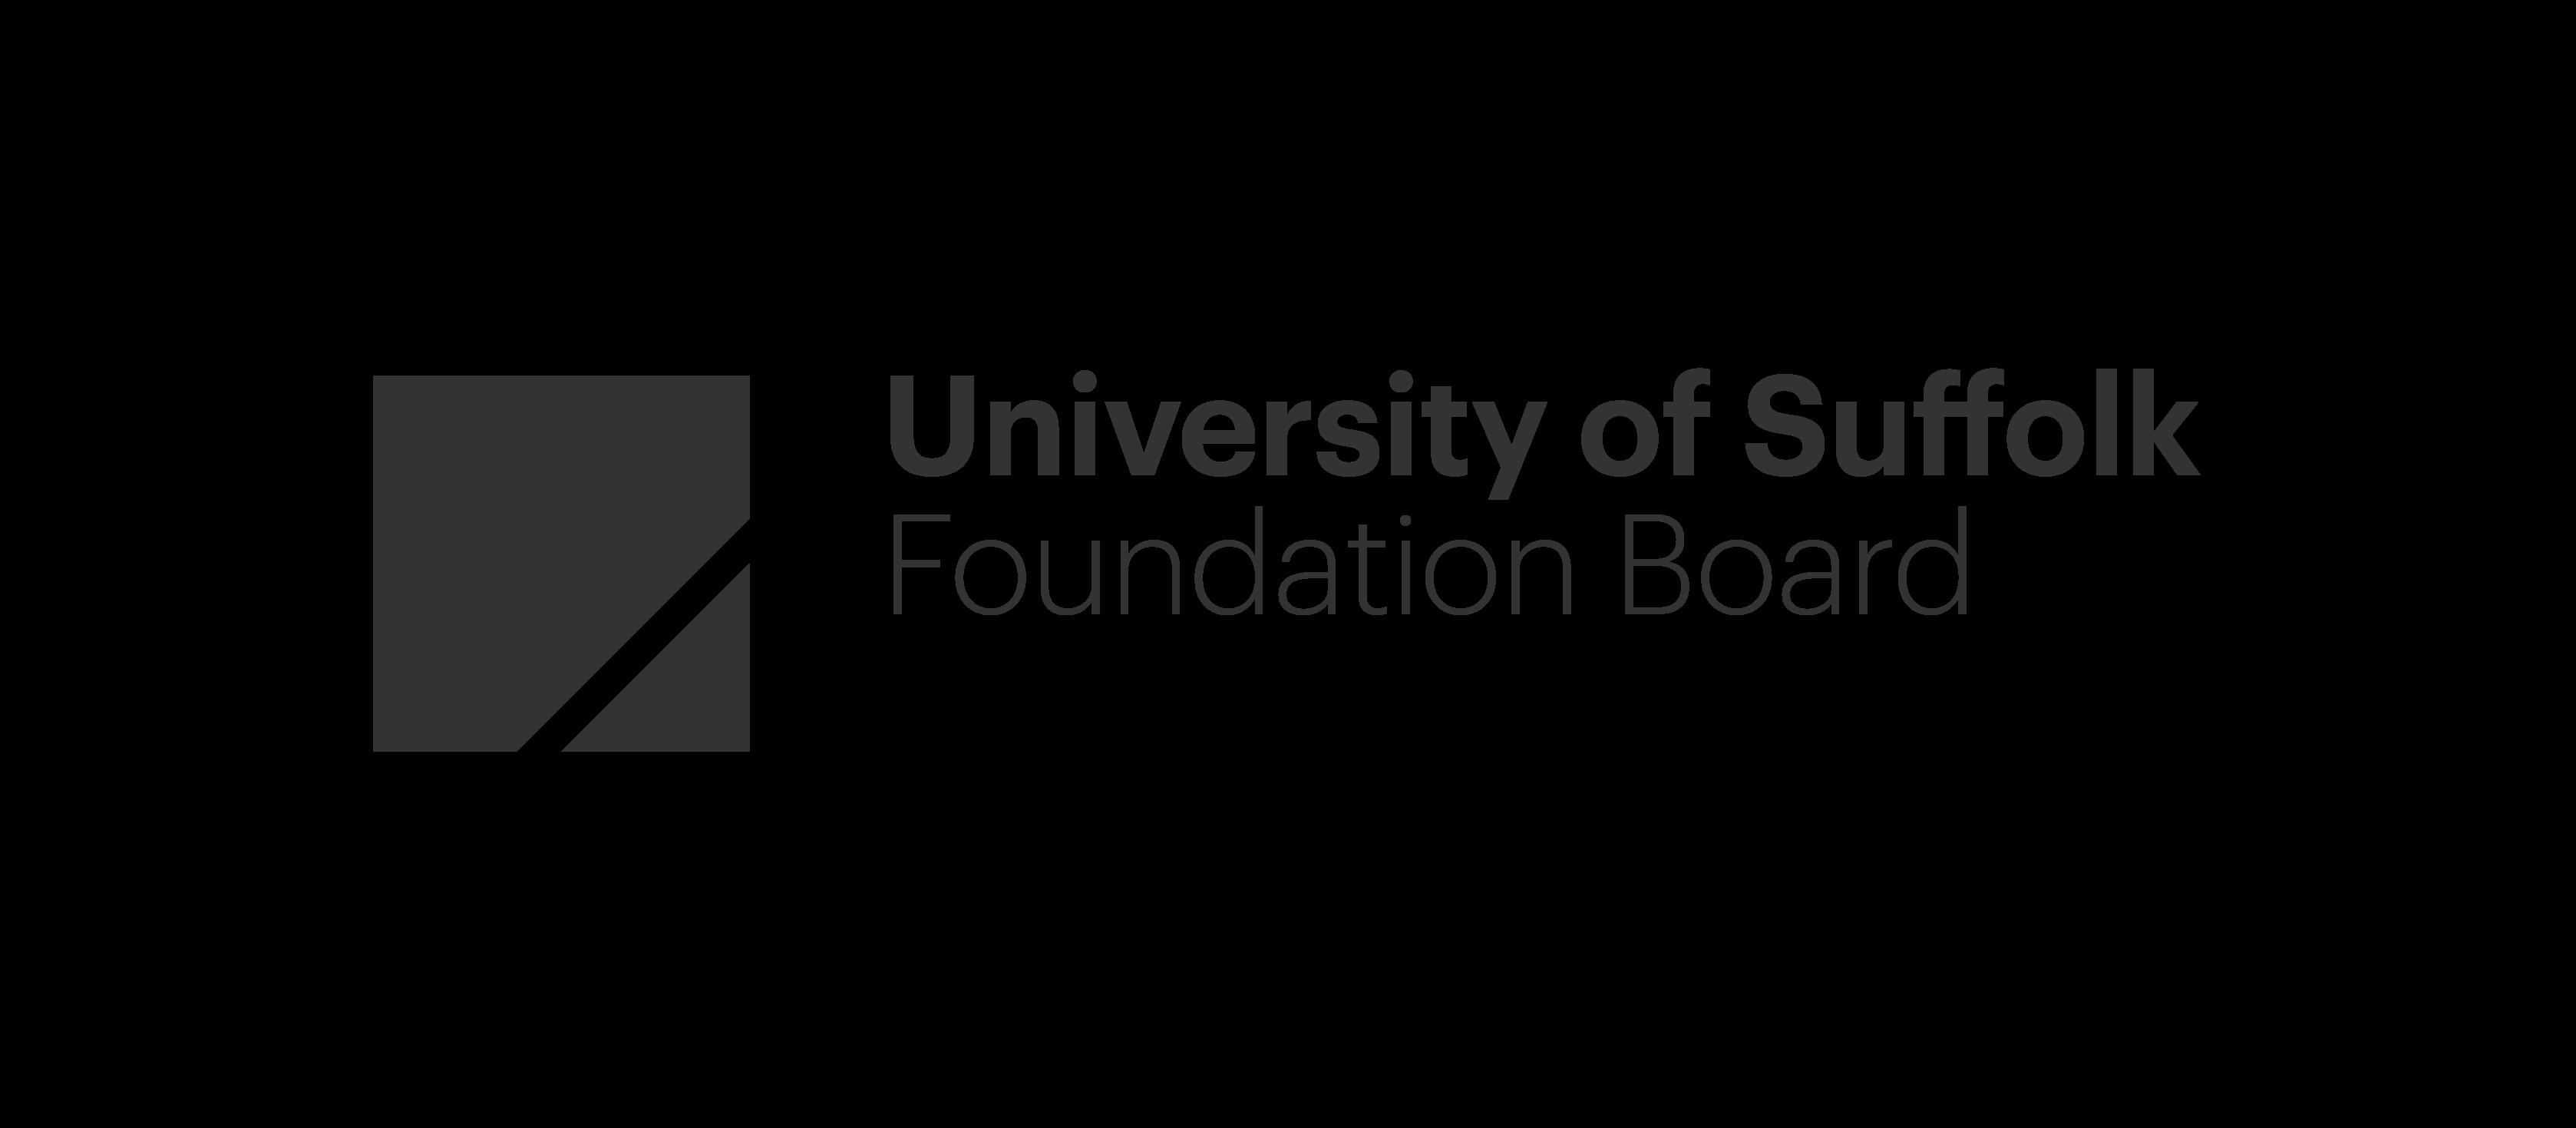 University-of-Suffolk SB Logo Foundation-Board RGB Mono-01